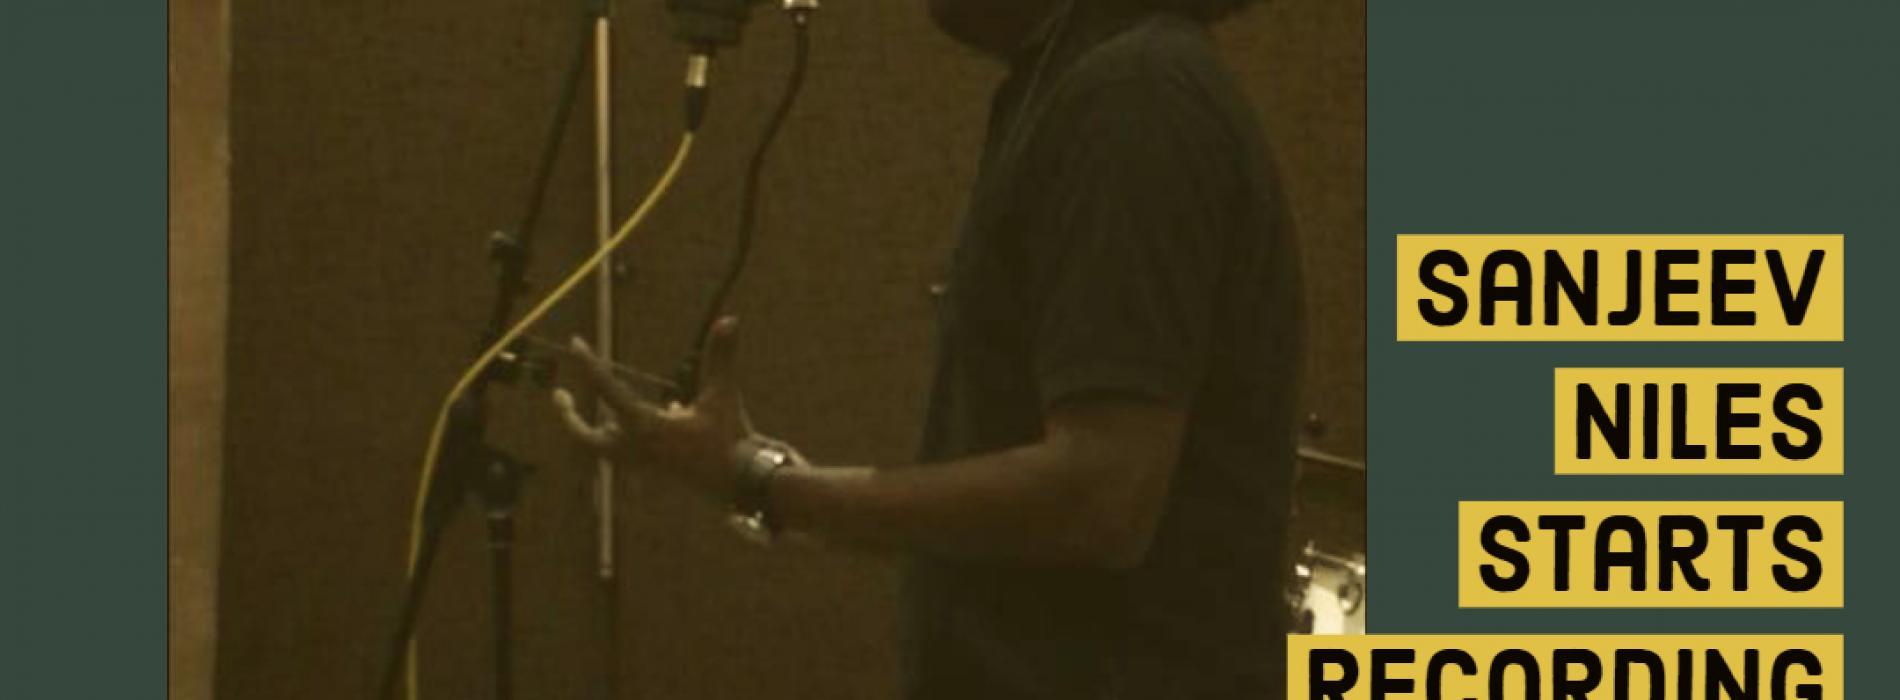 Sanjeev Niles Is Recording Again!